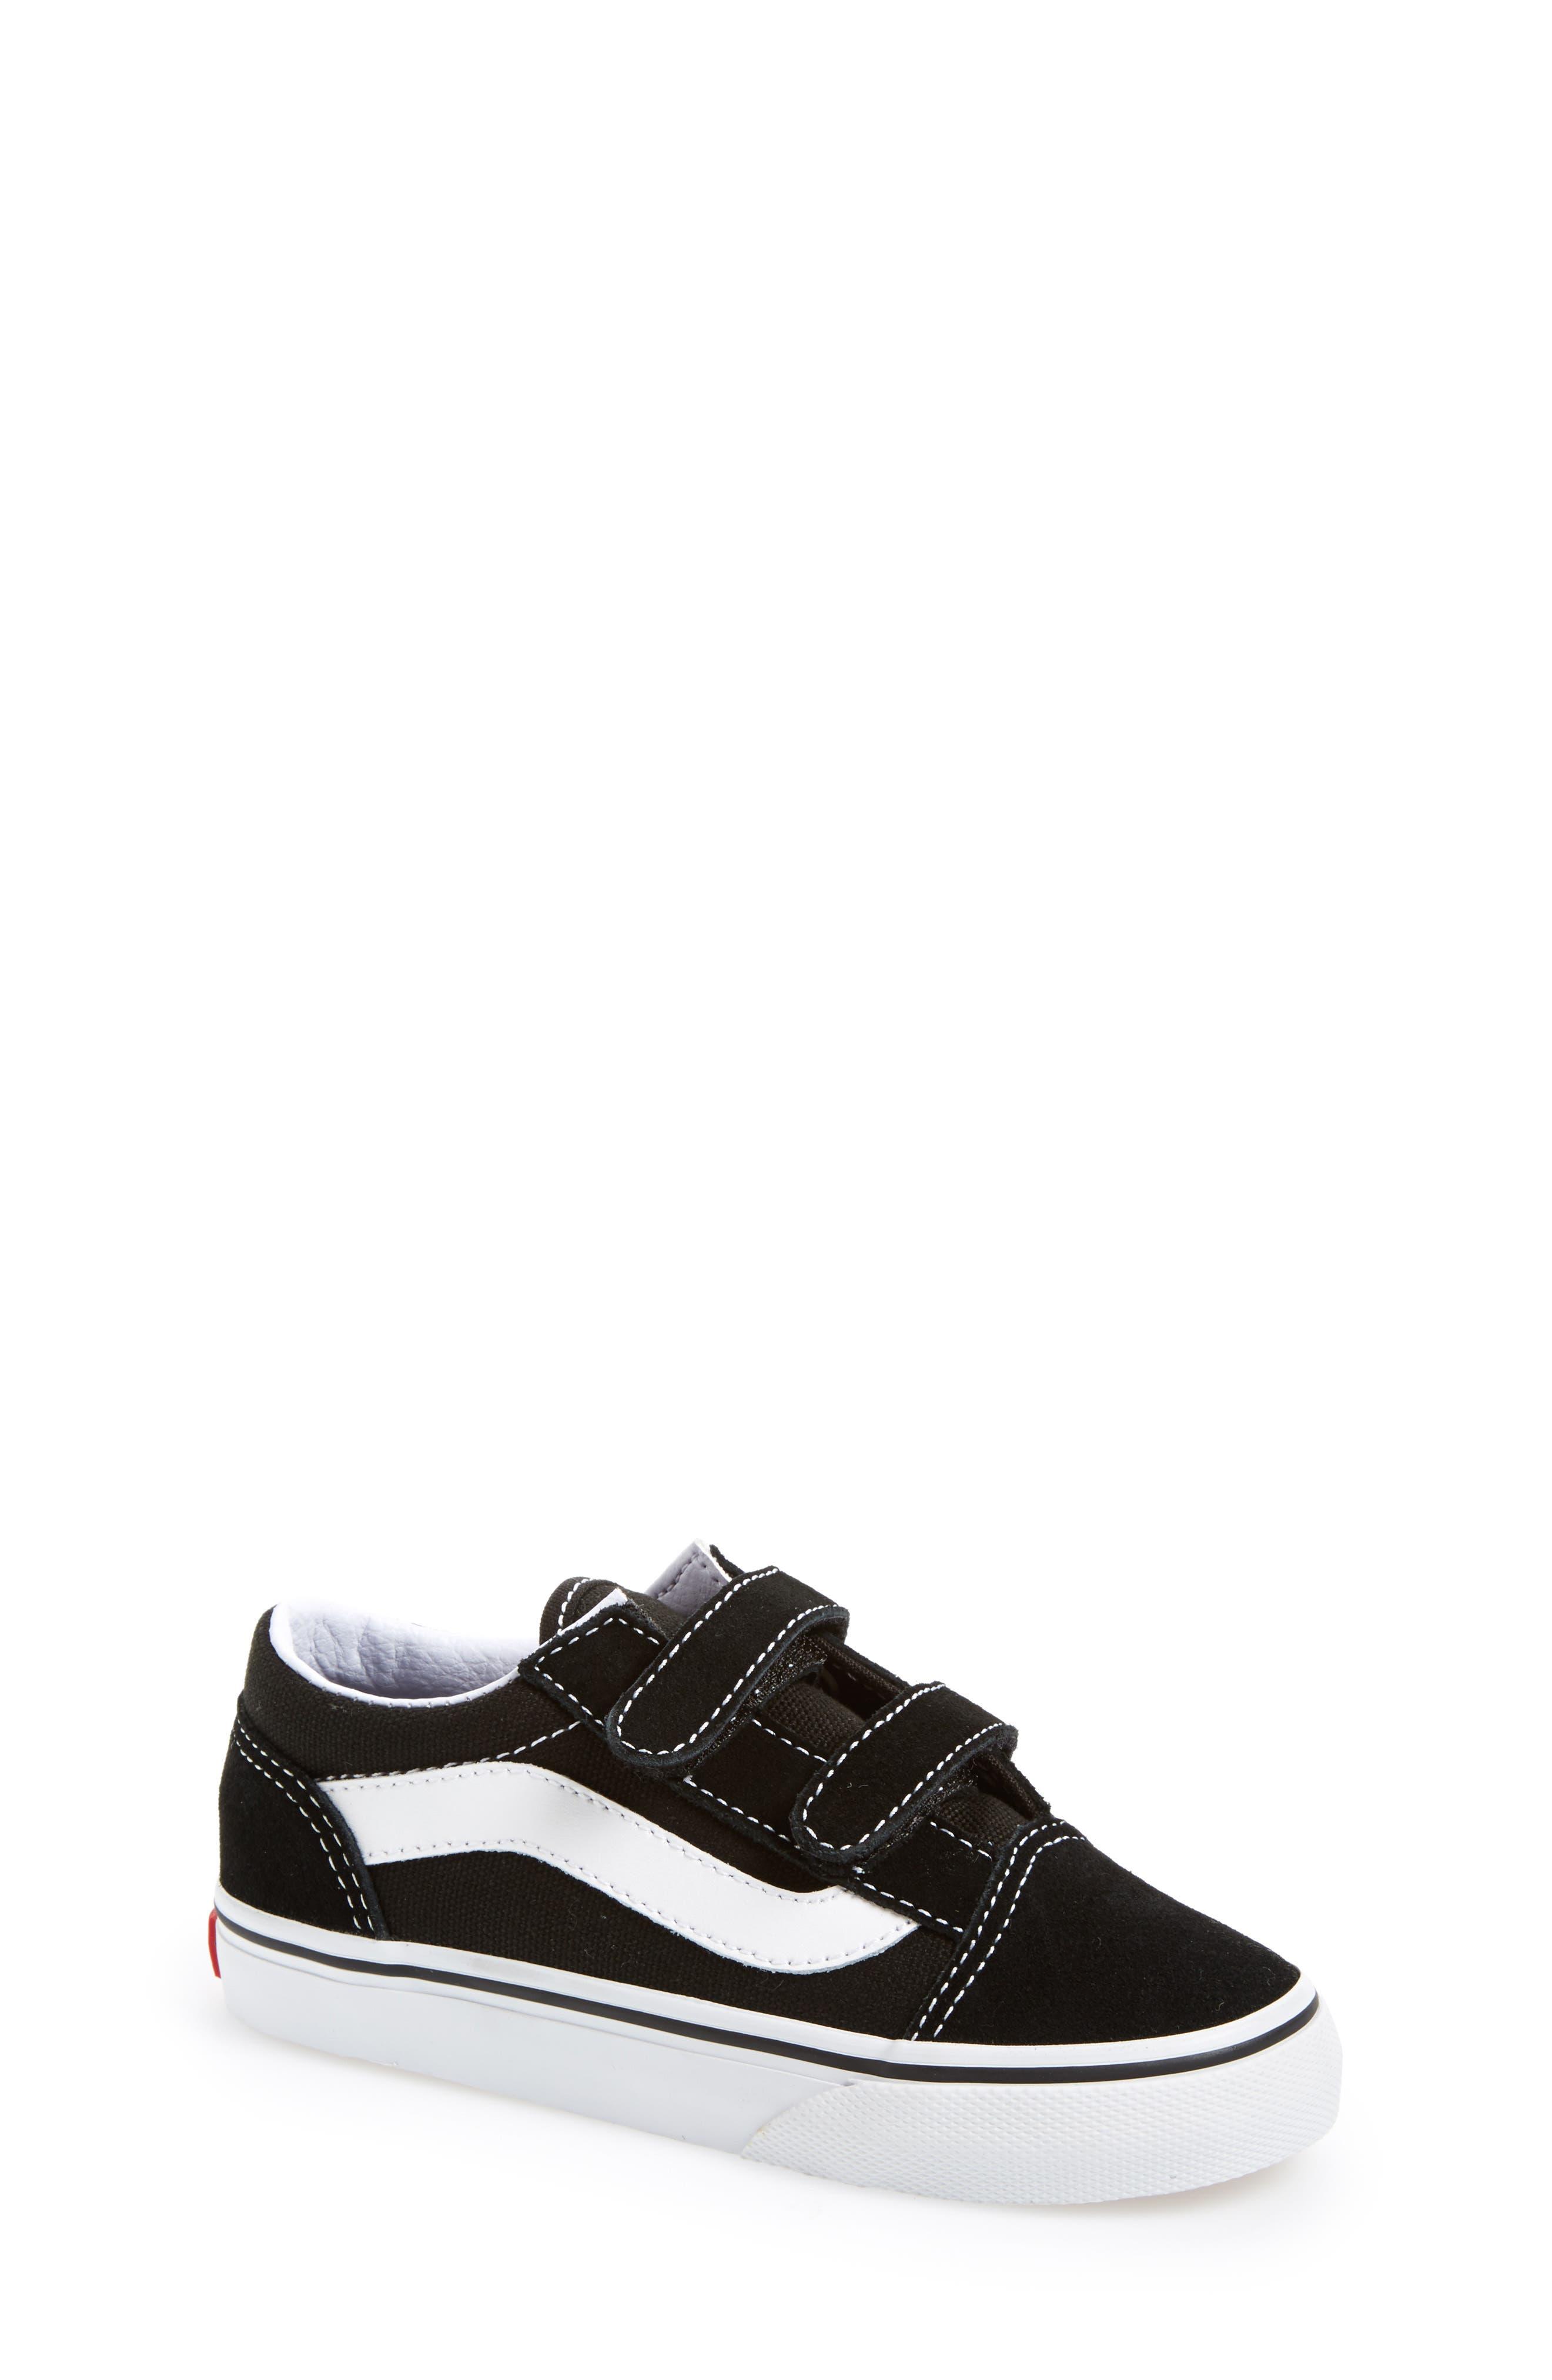 Alternate Image 1 Selected - Vans 'Old Skool V' Sneaker (Toddler, Little Kid & Big Kid)